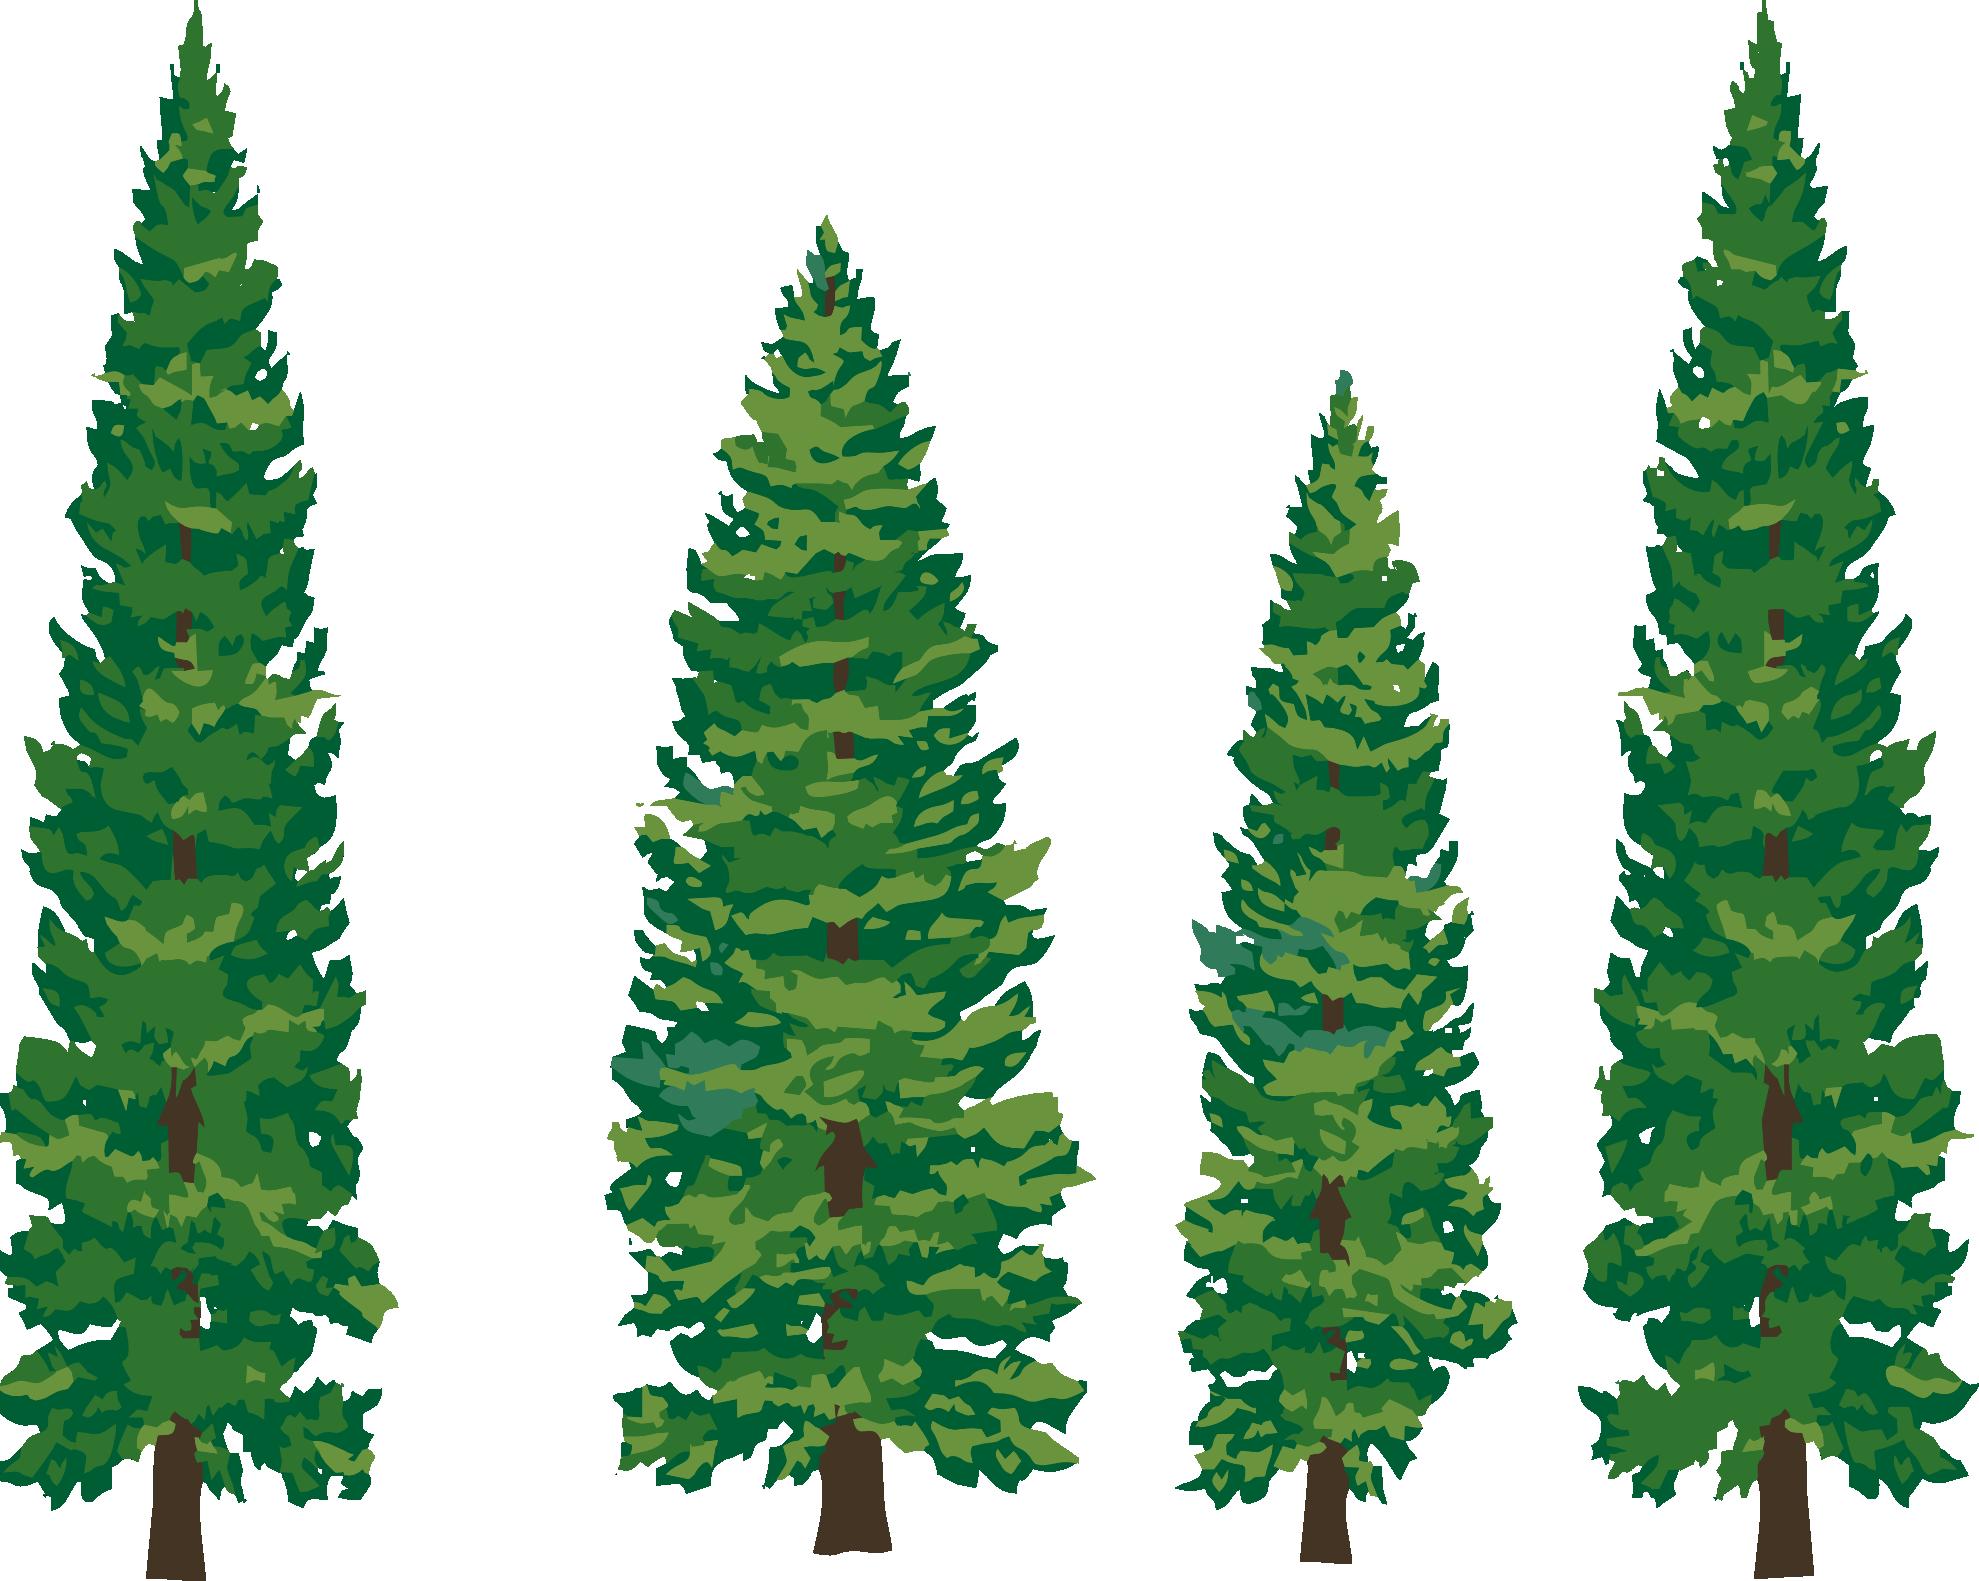 Needle clipart pine tree. Green forest trees desktop